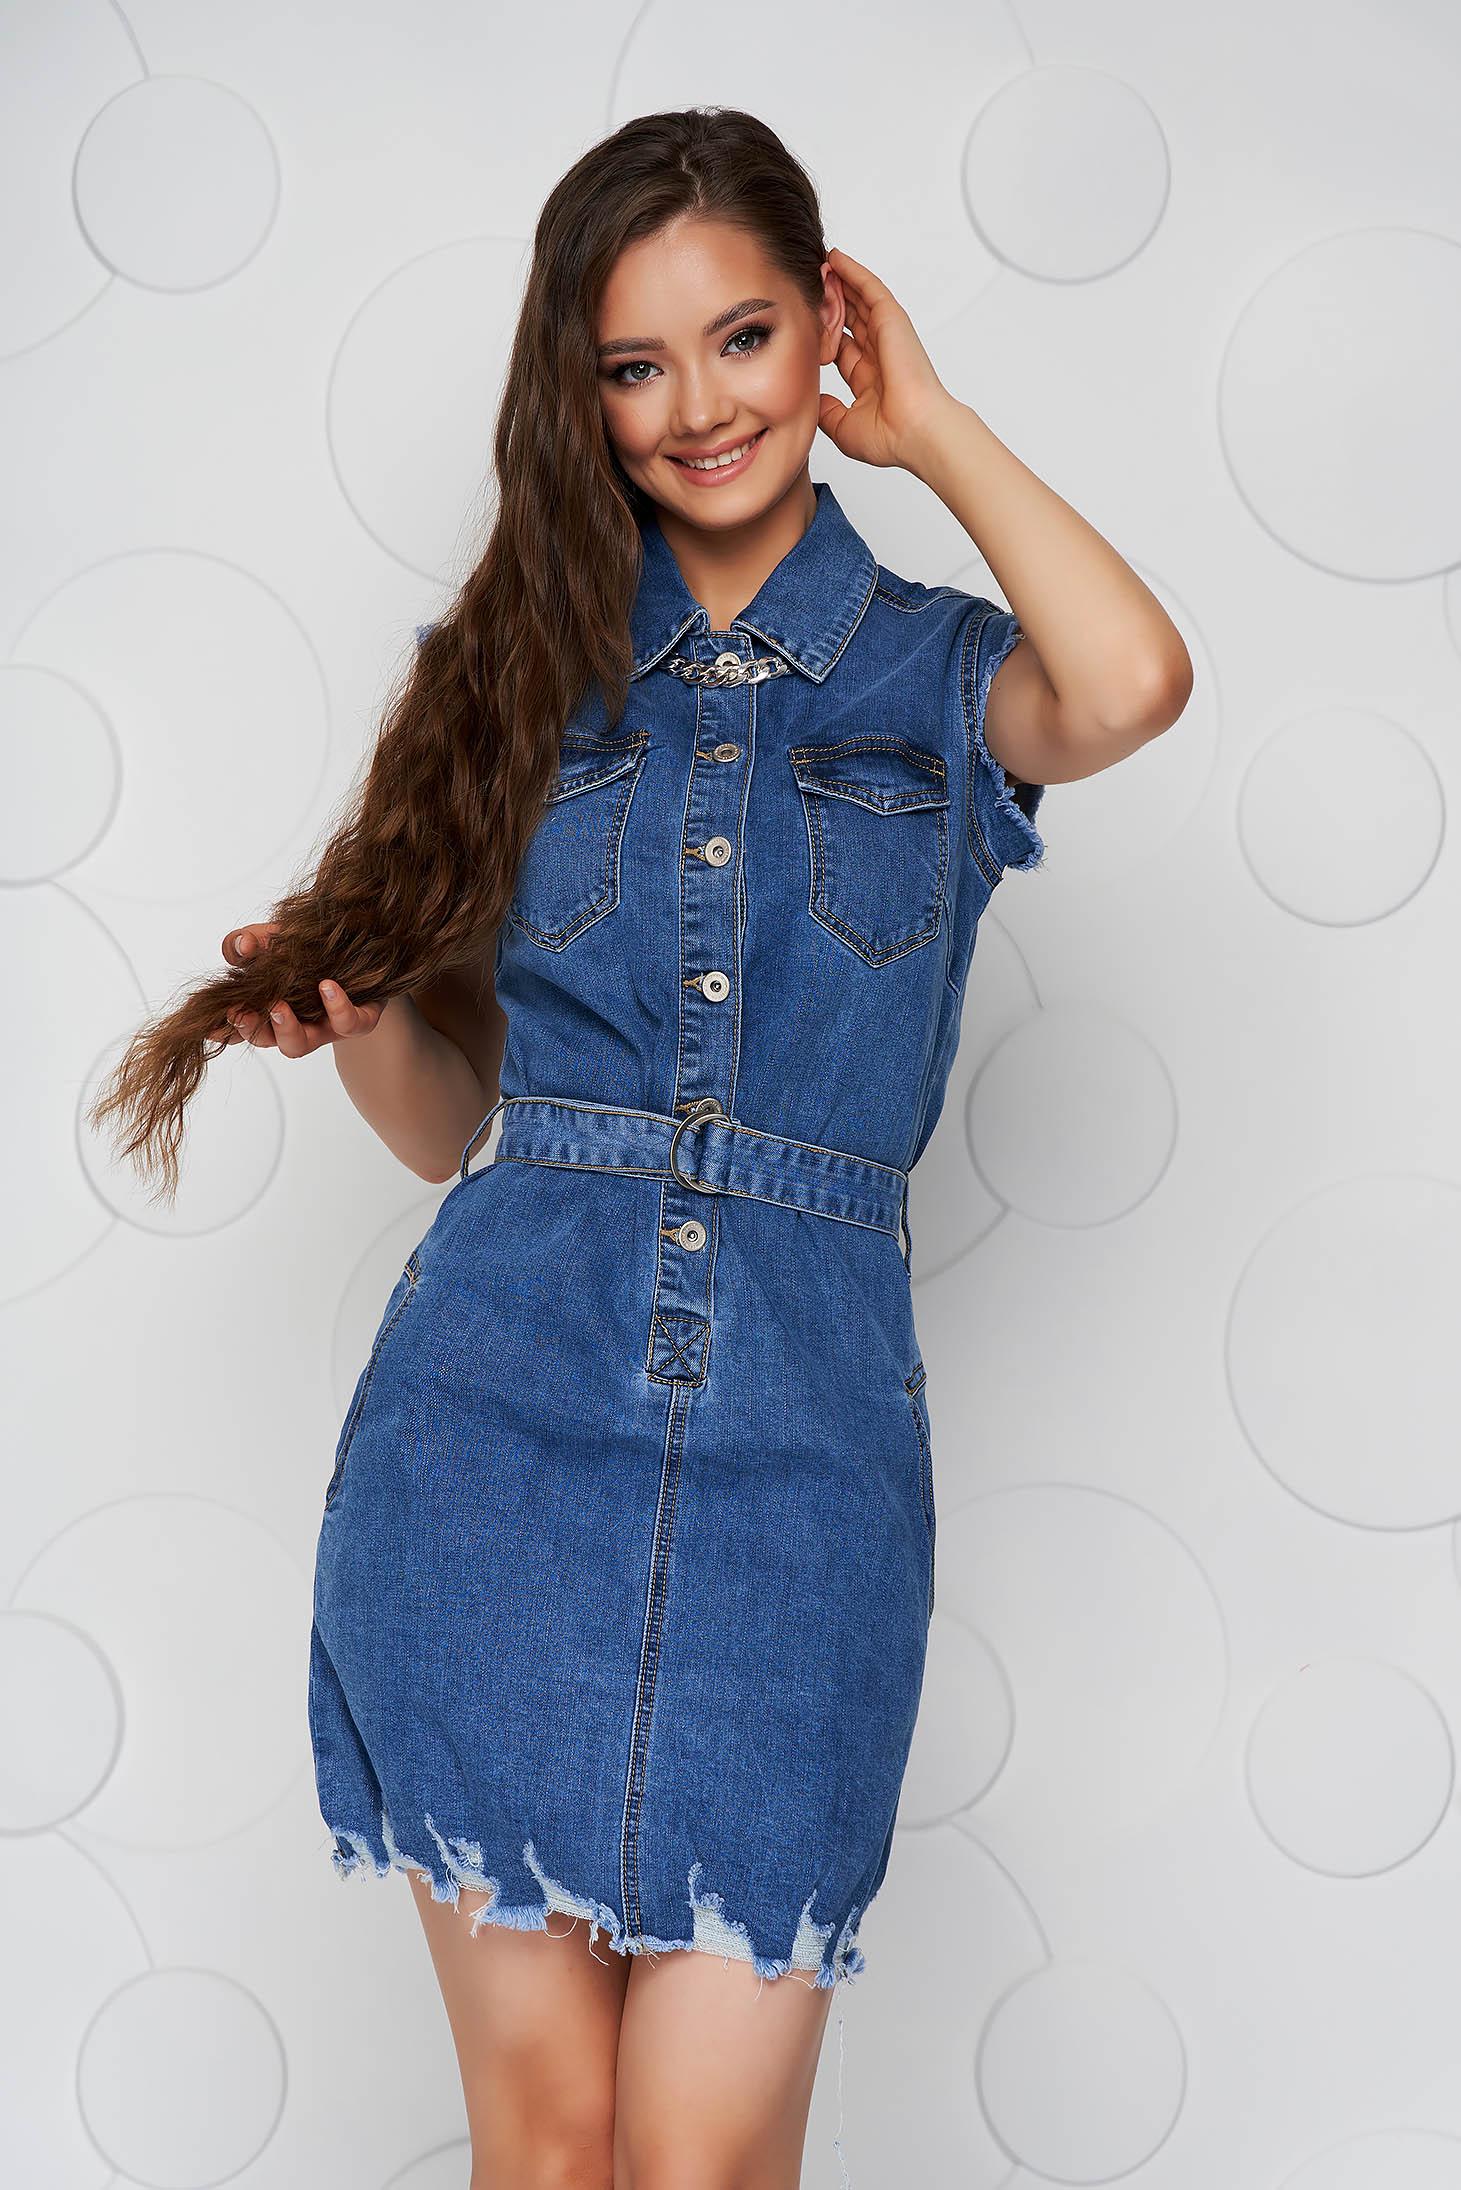 Blue casual short cut denim sleeveless dress with pockets